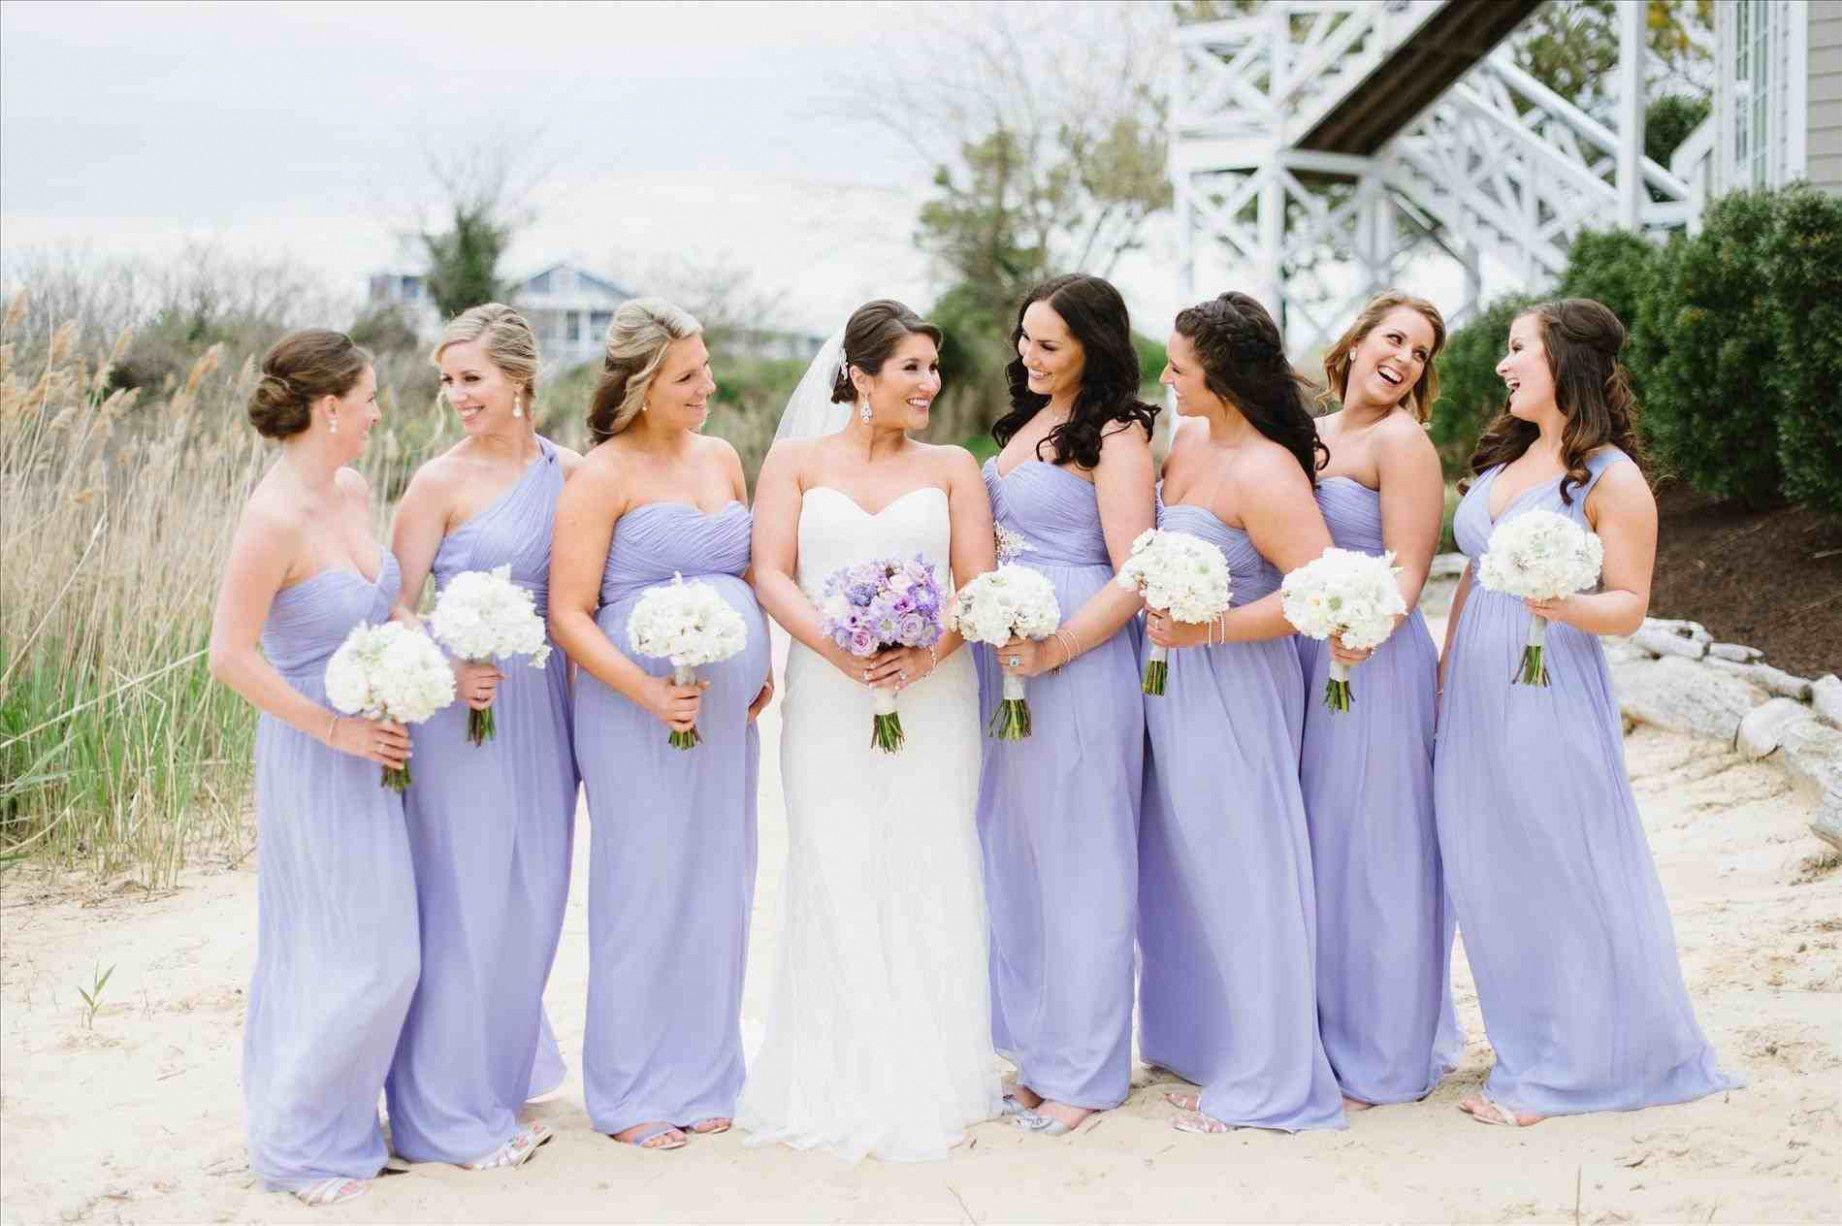 Purple Wedding Men Bridesmaid Dresses Beach Wedding Bridesmaid Dresses Pastel Purple Bridesmaid Dresses Beach Wedding Purple [ 1226 x 1842 Pixel ]